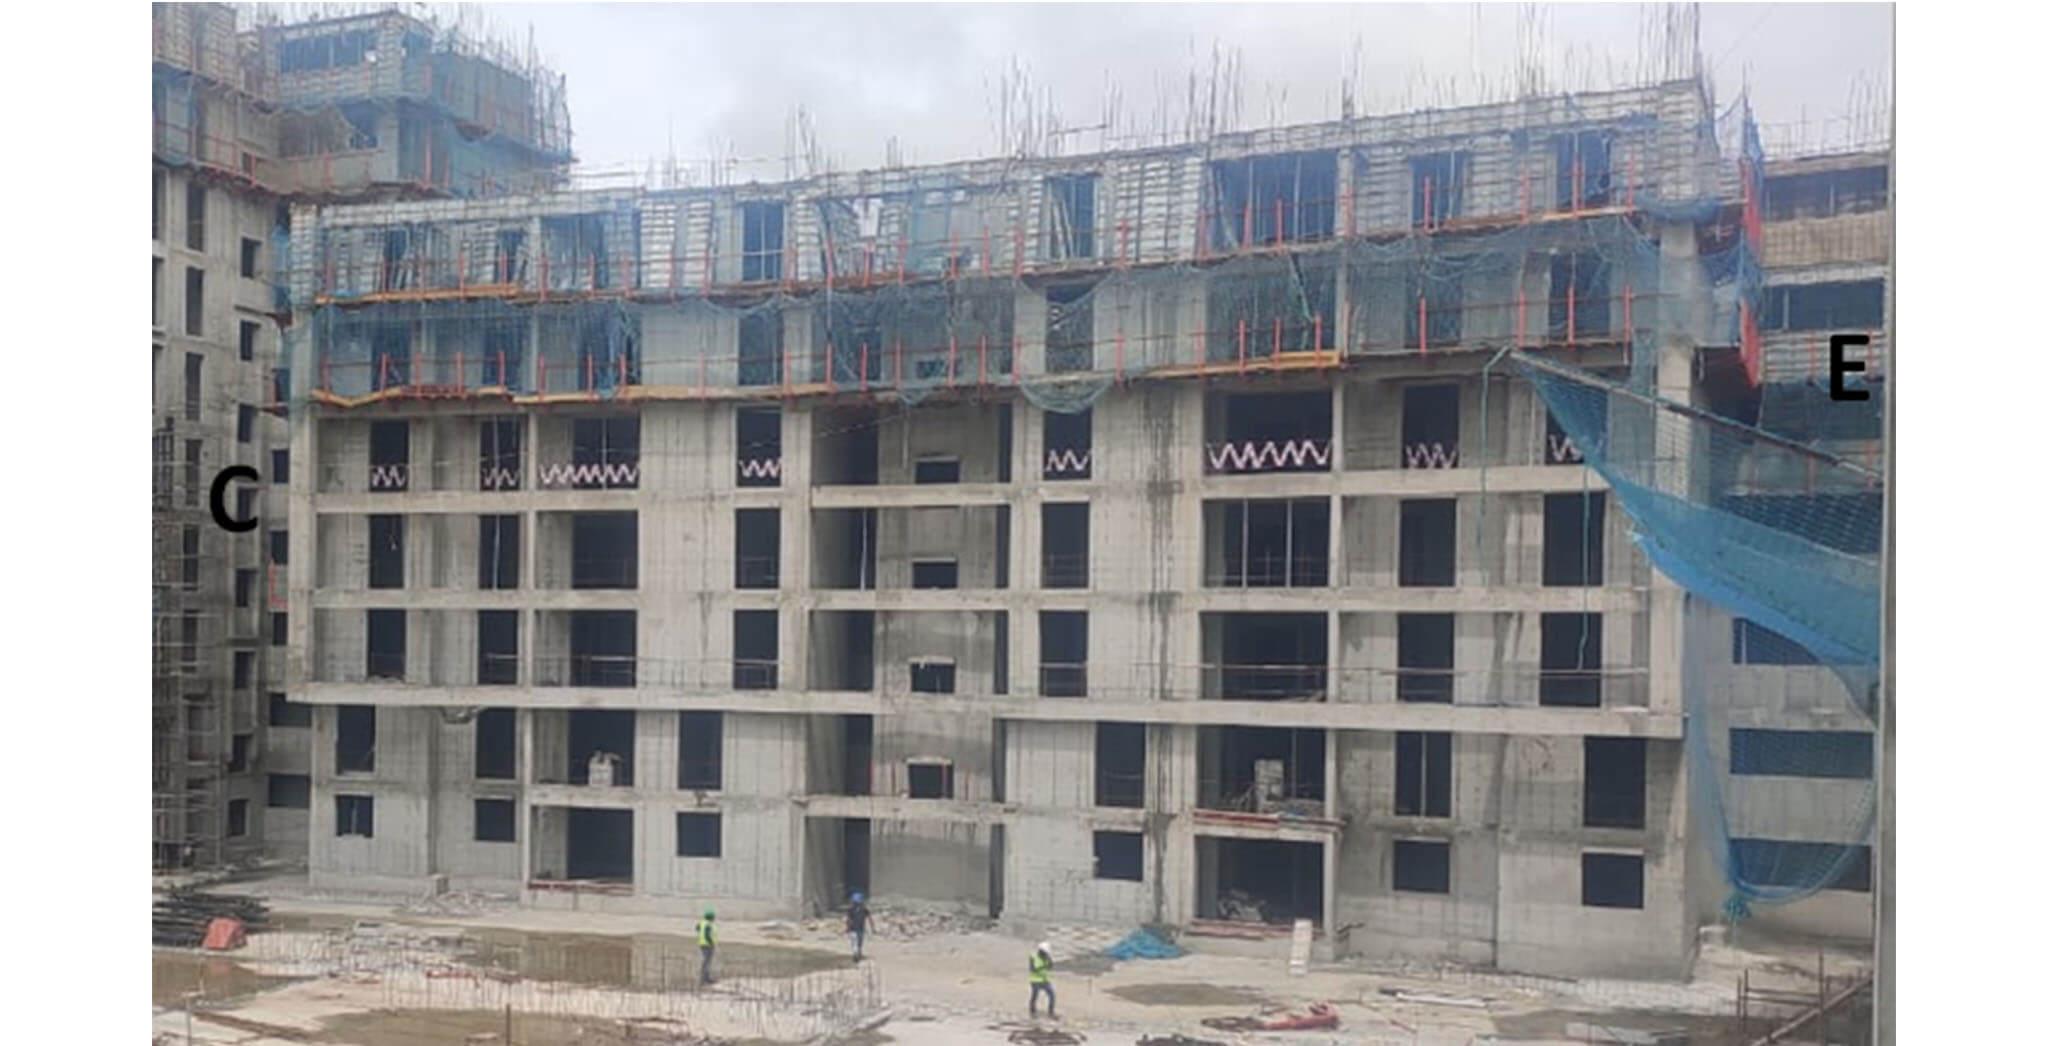 Jul 2020 - Serene: Low rise between C & E Towers—7th Floor slab work under progress.